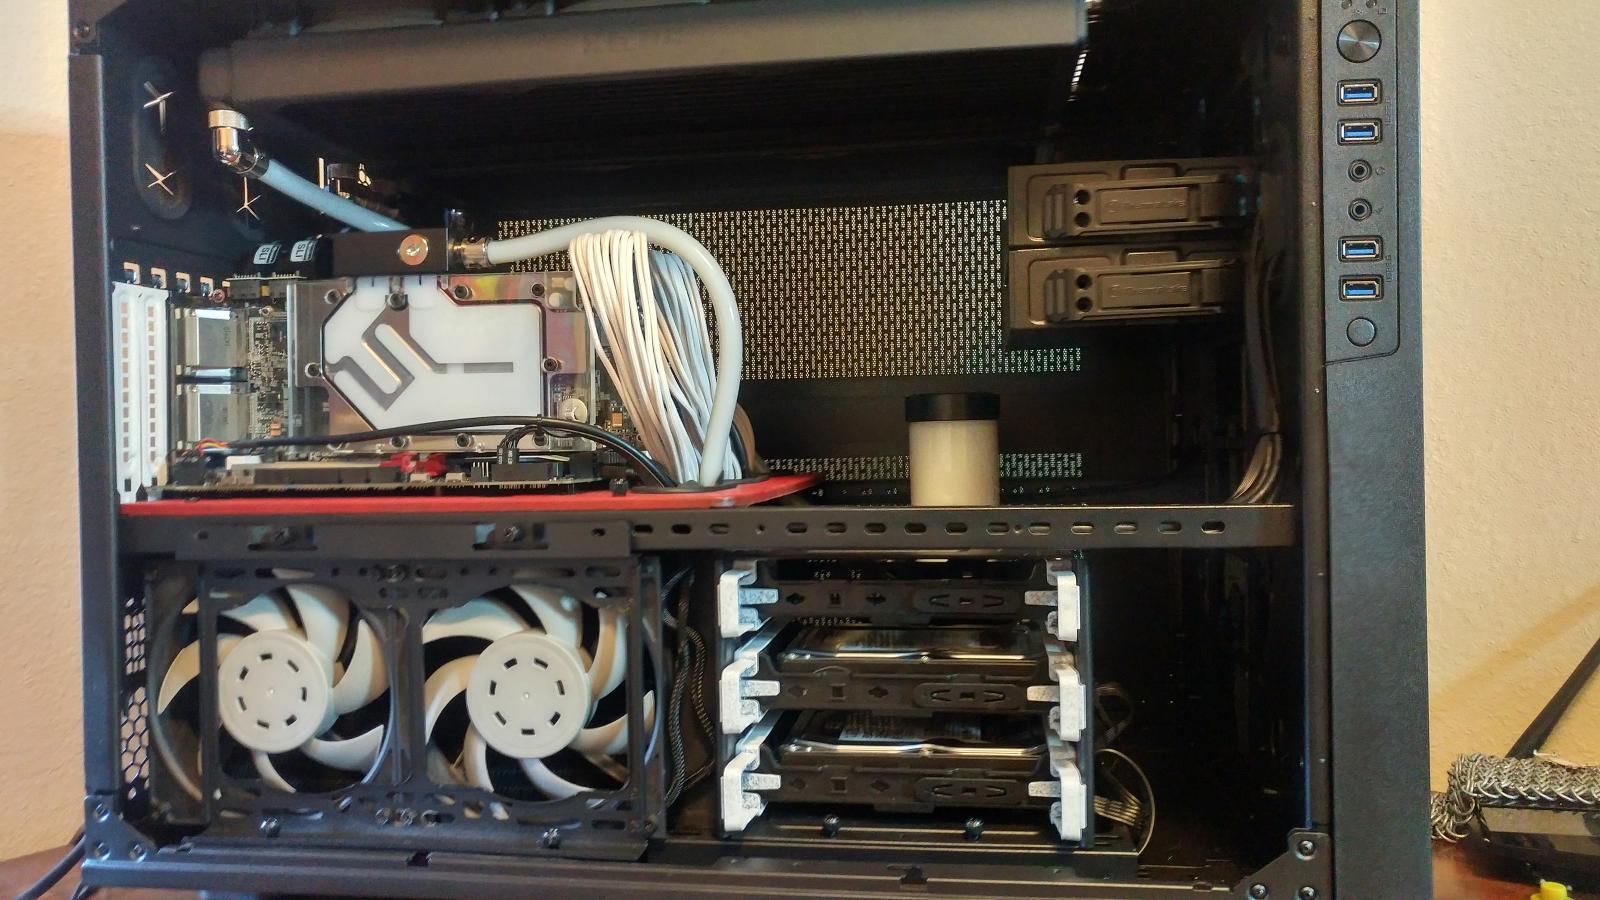 Photo of 2 x GTX 980 4GB gigabyte G1. W/EK blocks/backplates and sli bridge